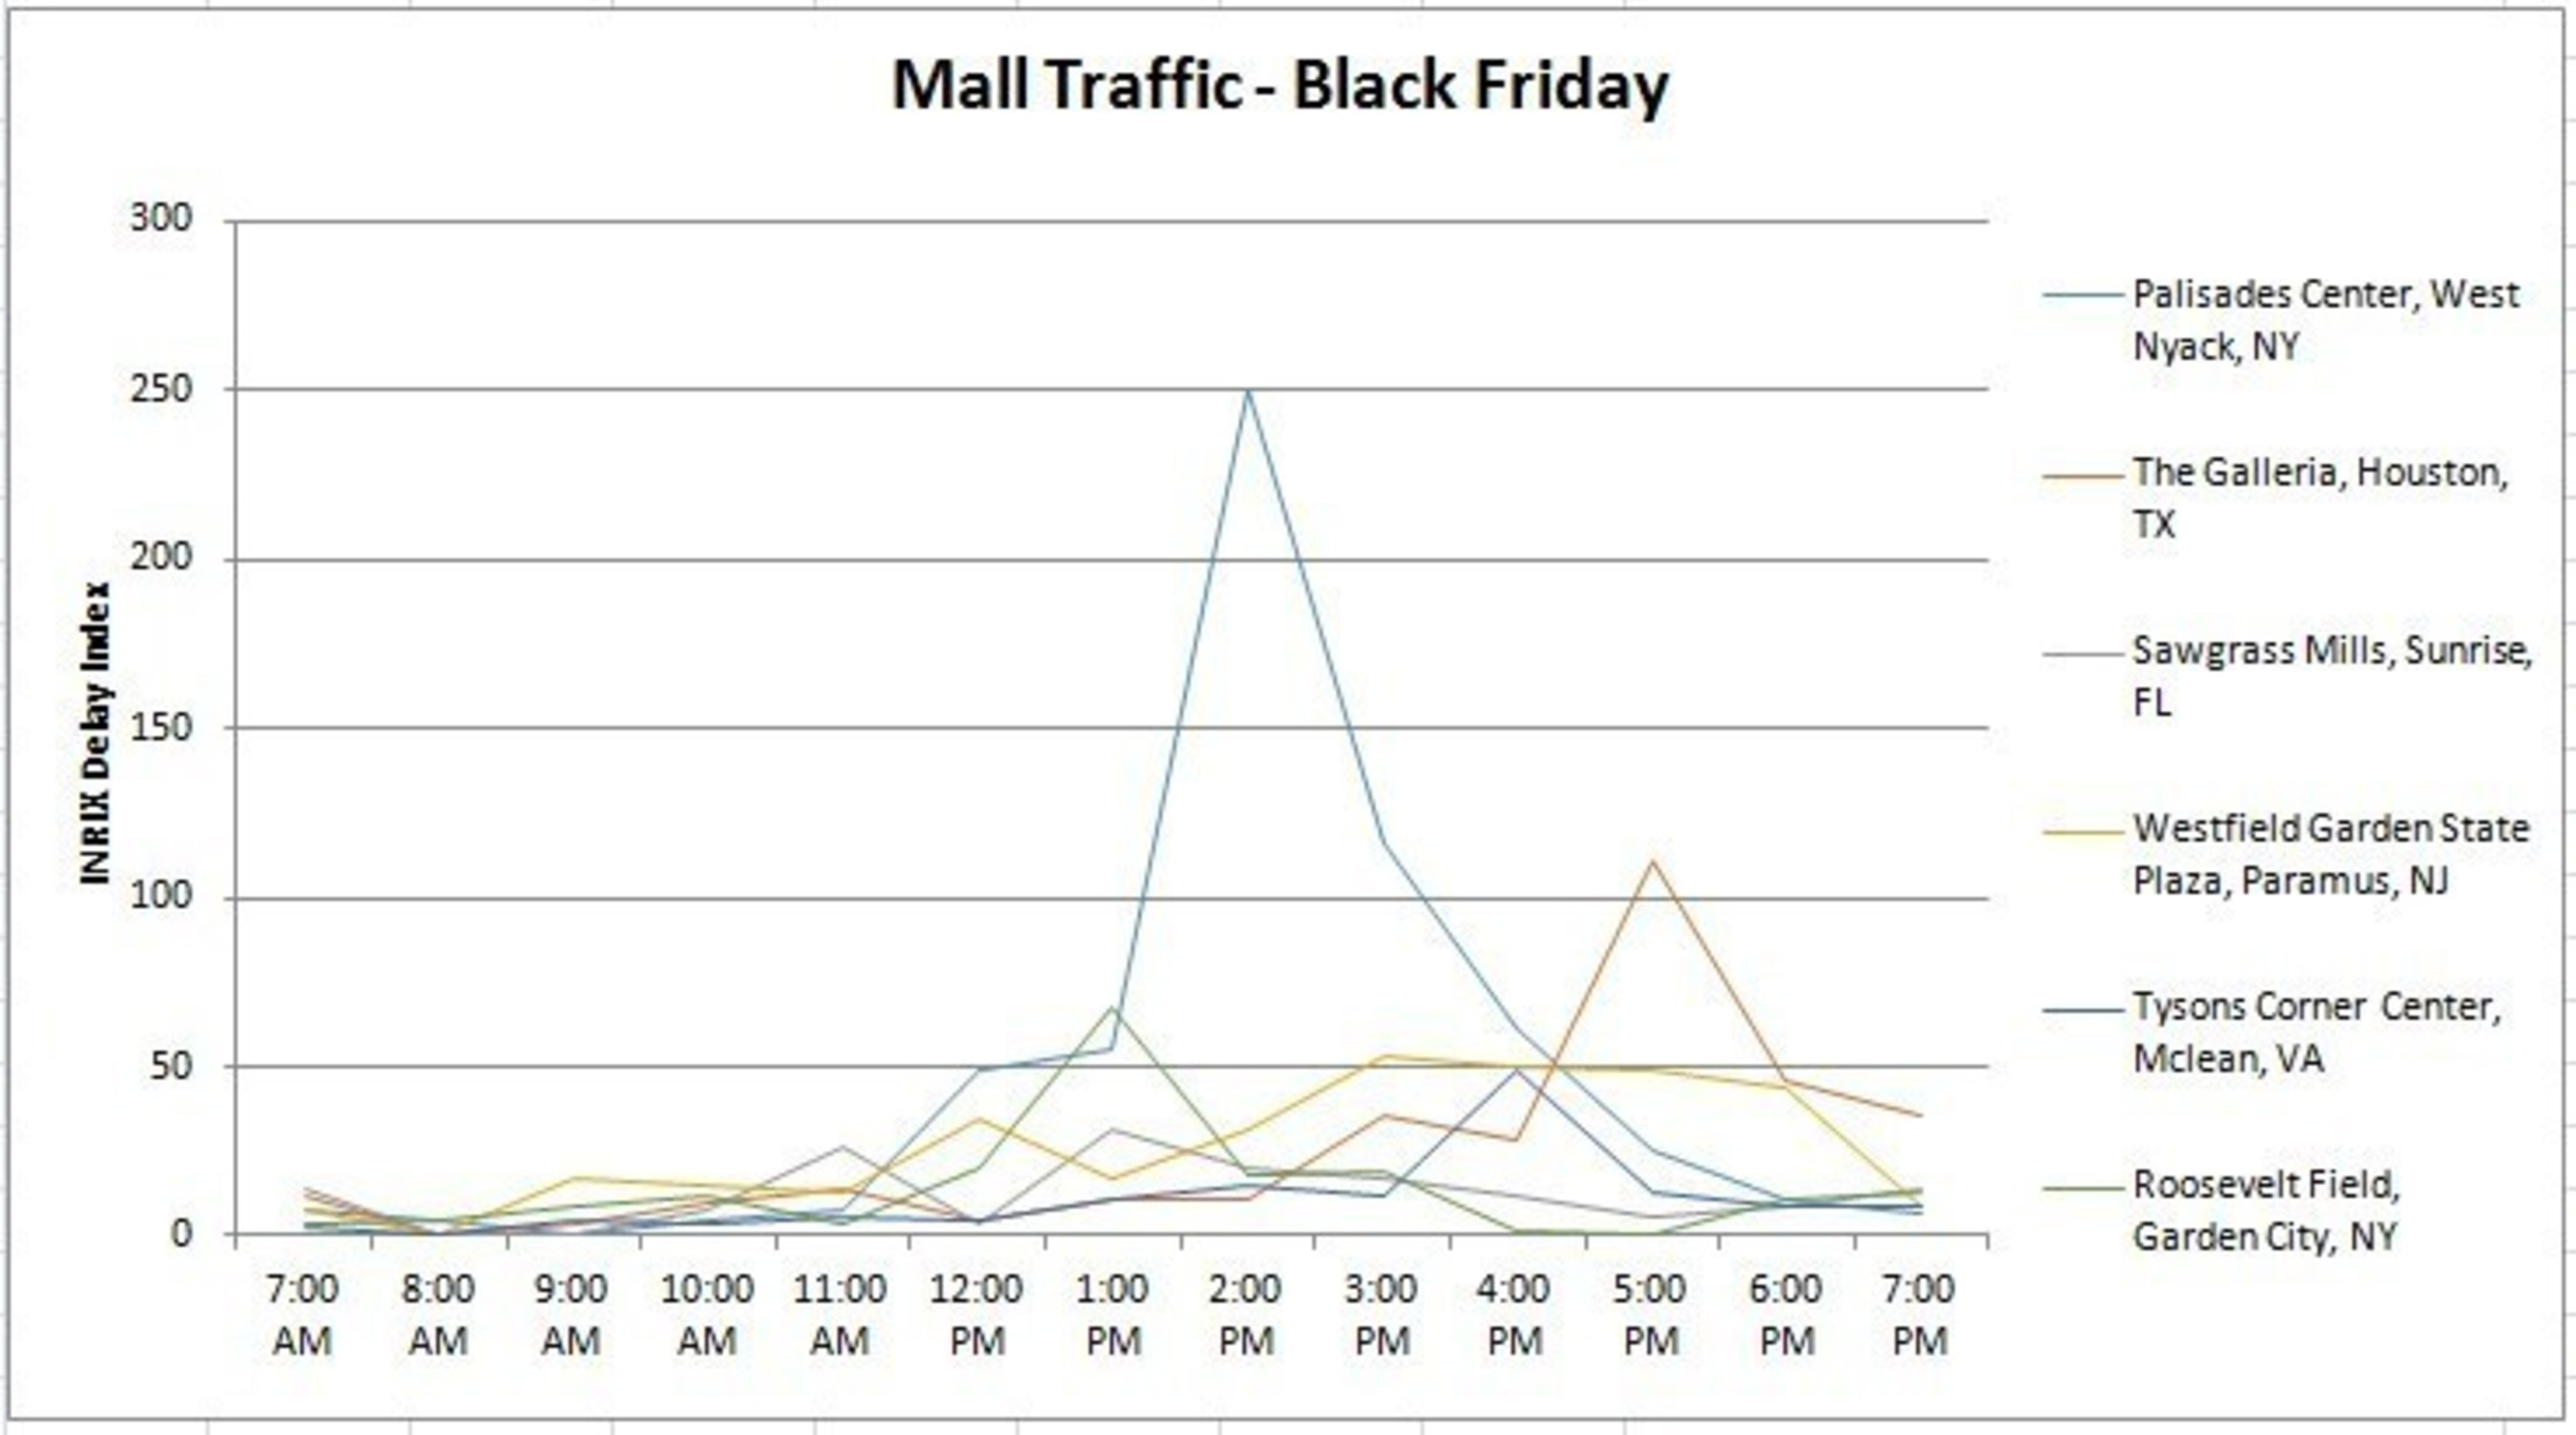 Mall Traffic - Black Friday